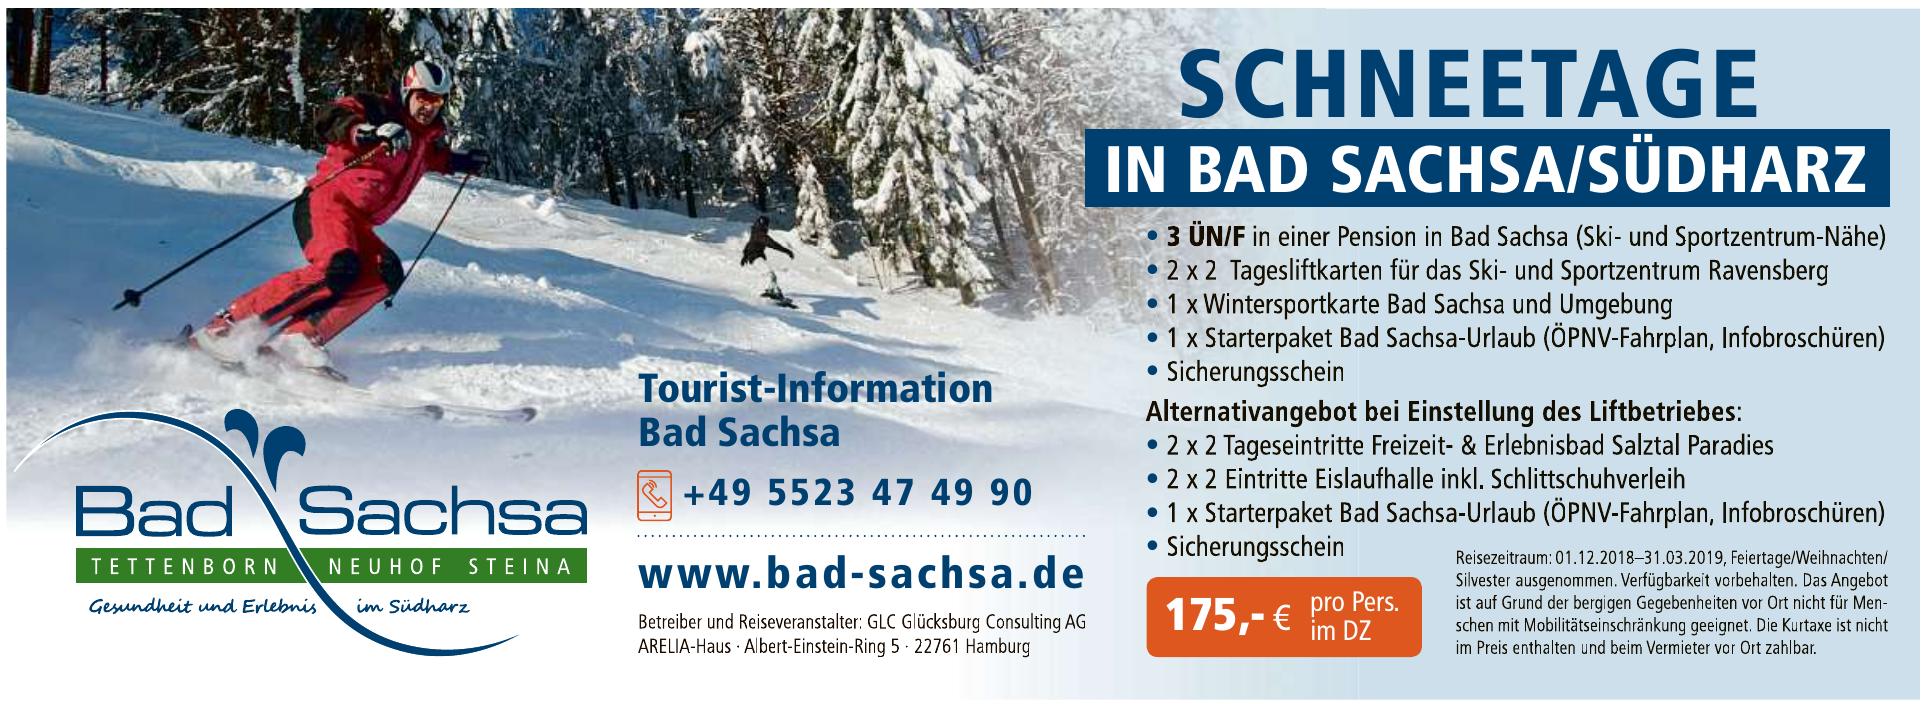 Tourist-Information Bad Sachsa